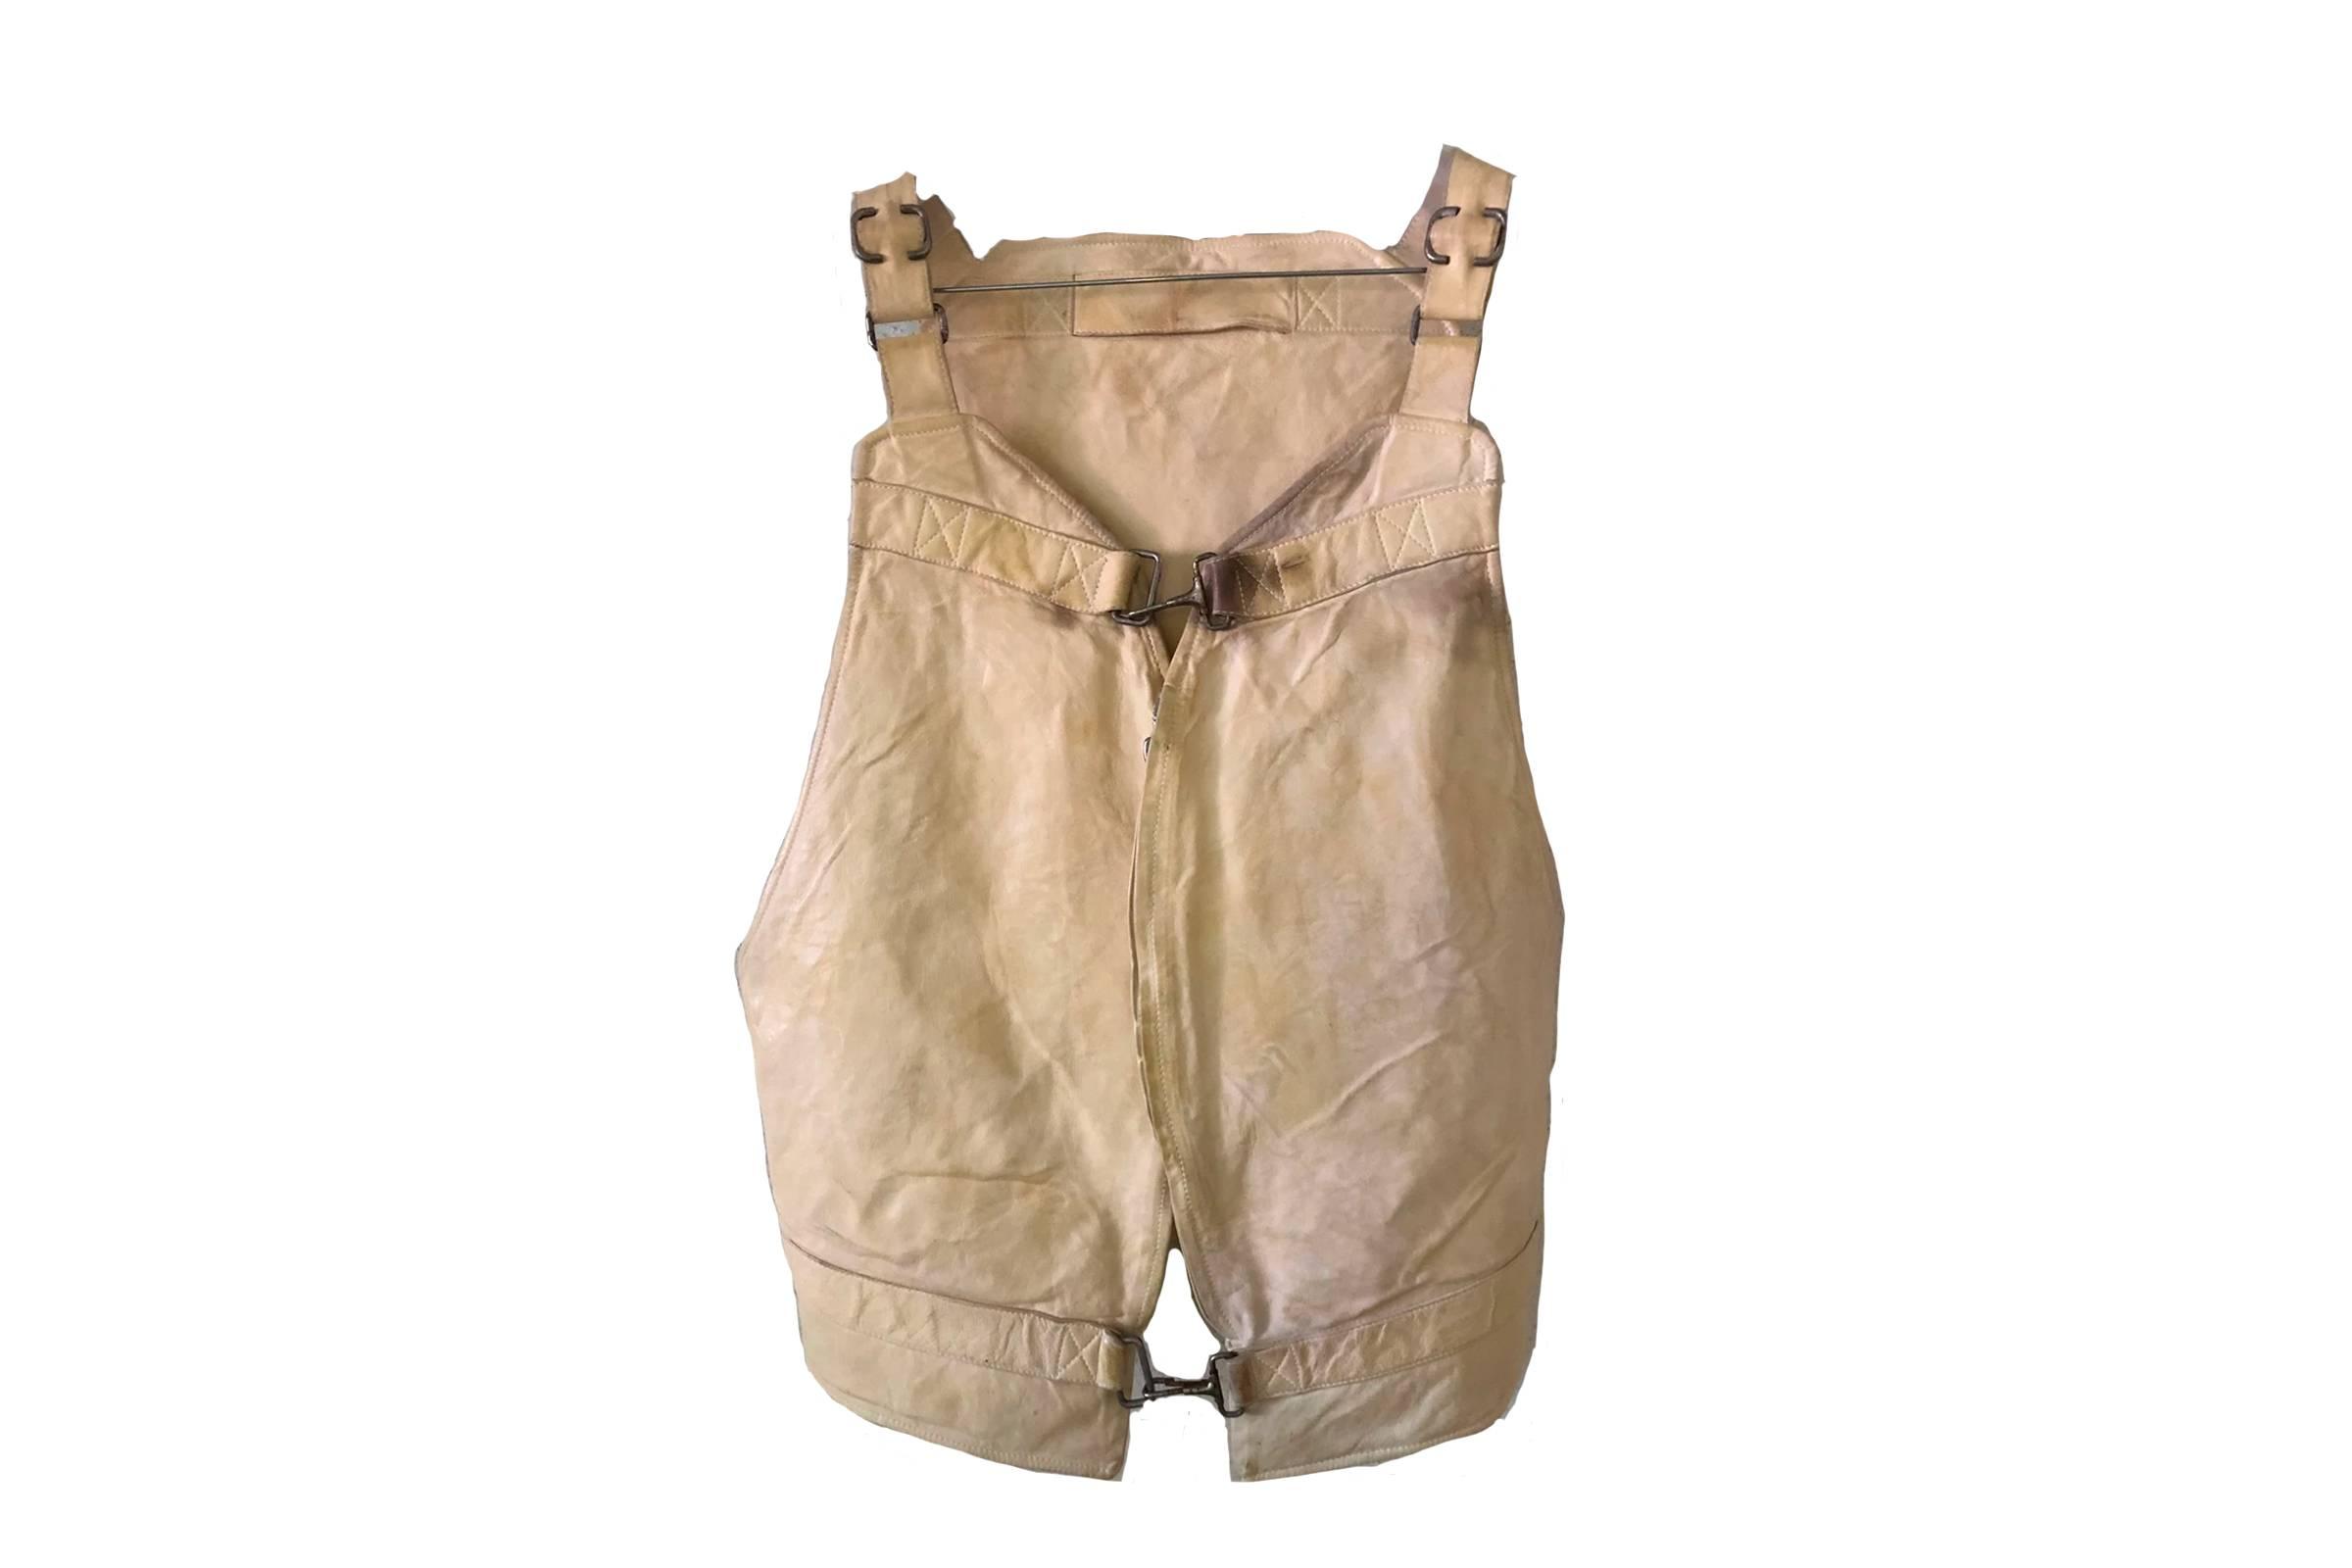 Carol Christian Poell ROOMS/01 Leather Vest Bag